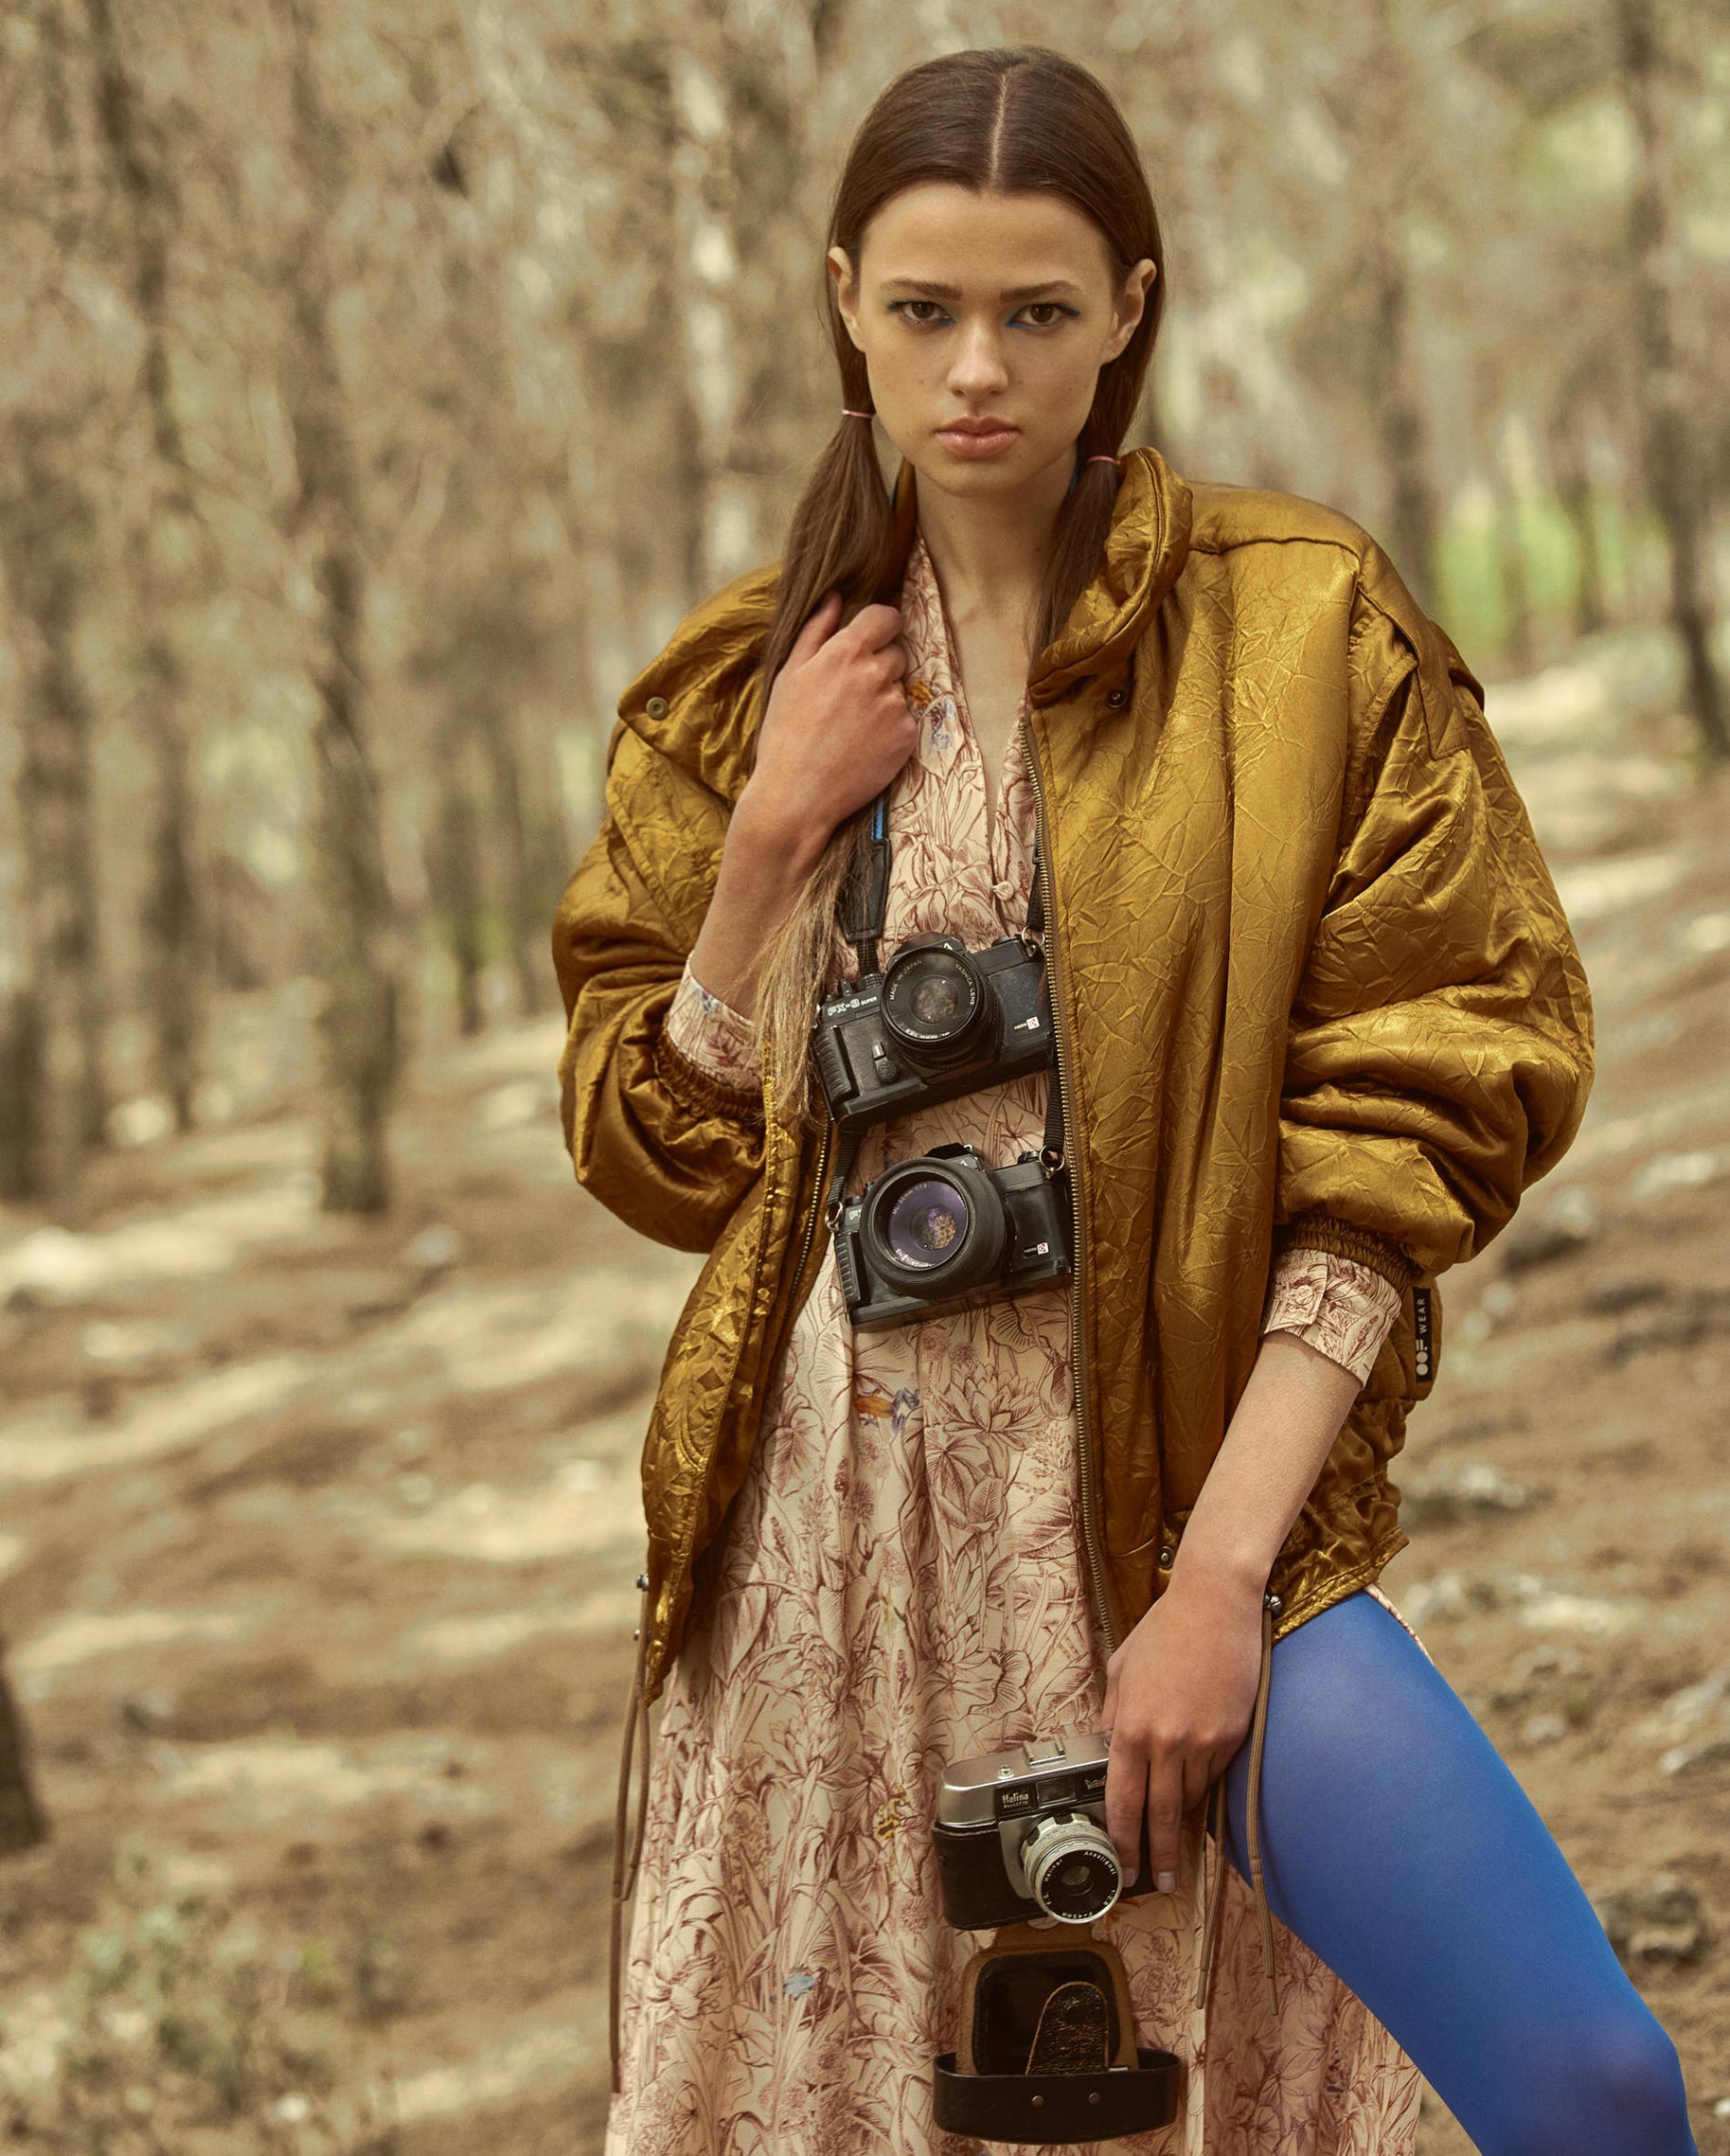 Диана Свиридова в лесу демонстрирует винтажную технику и новинки моды / фото 05